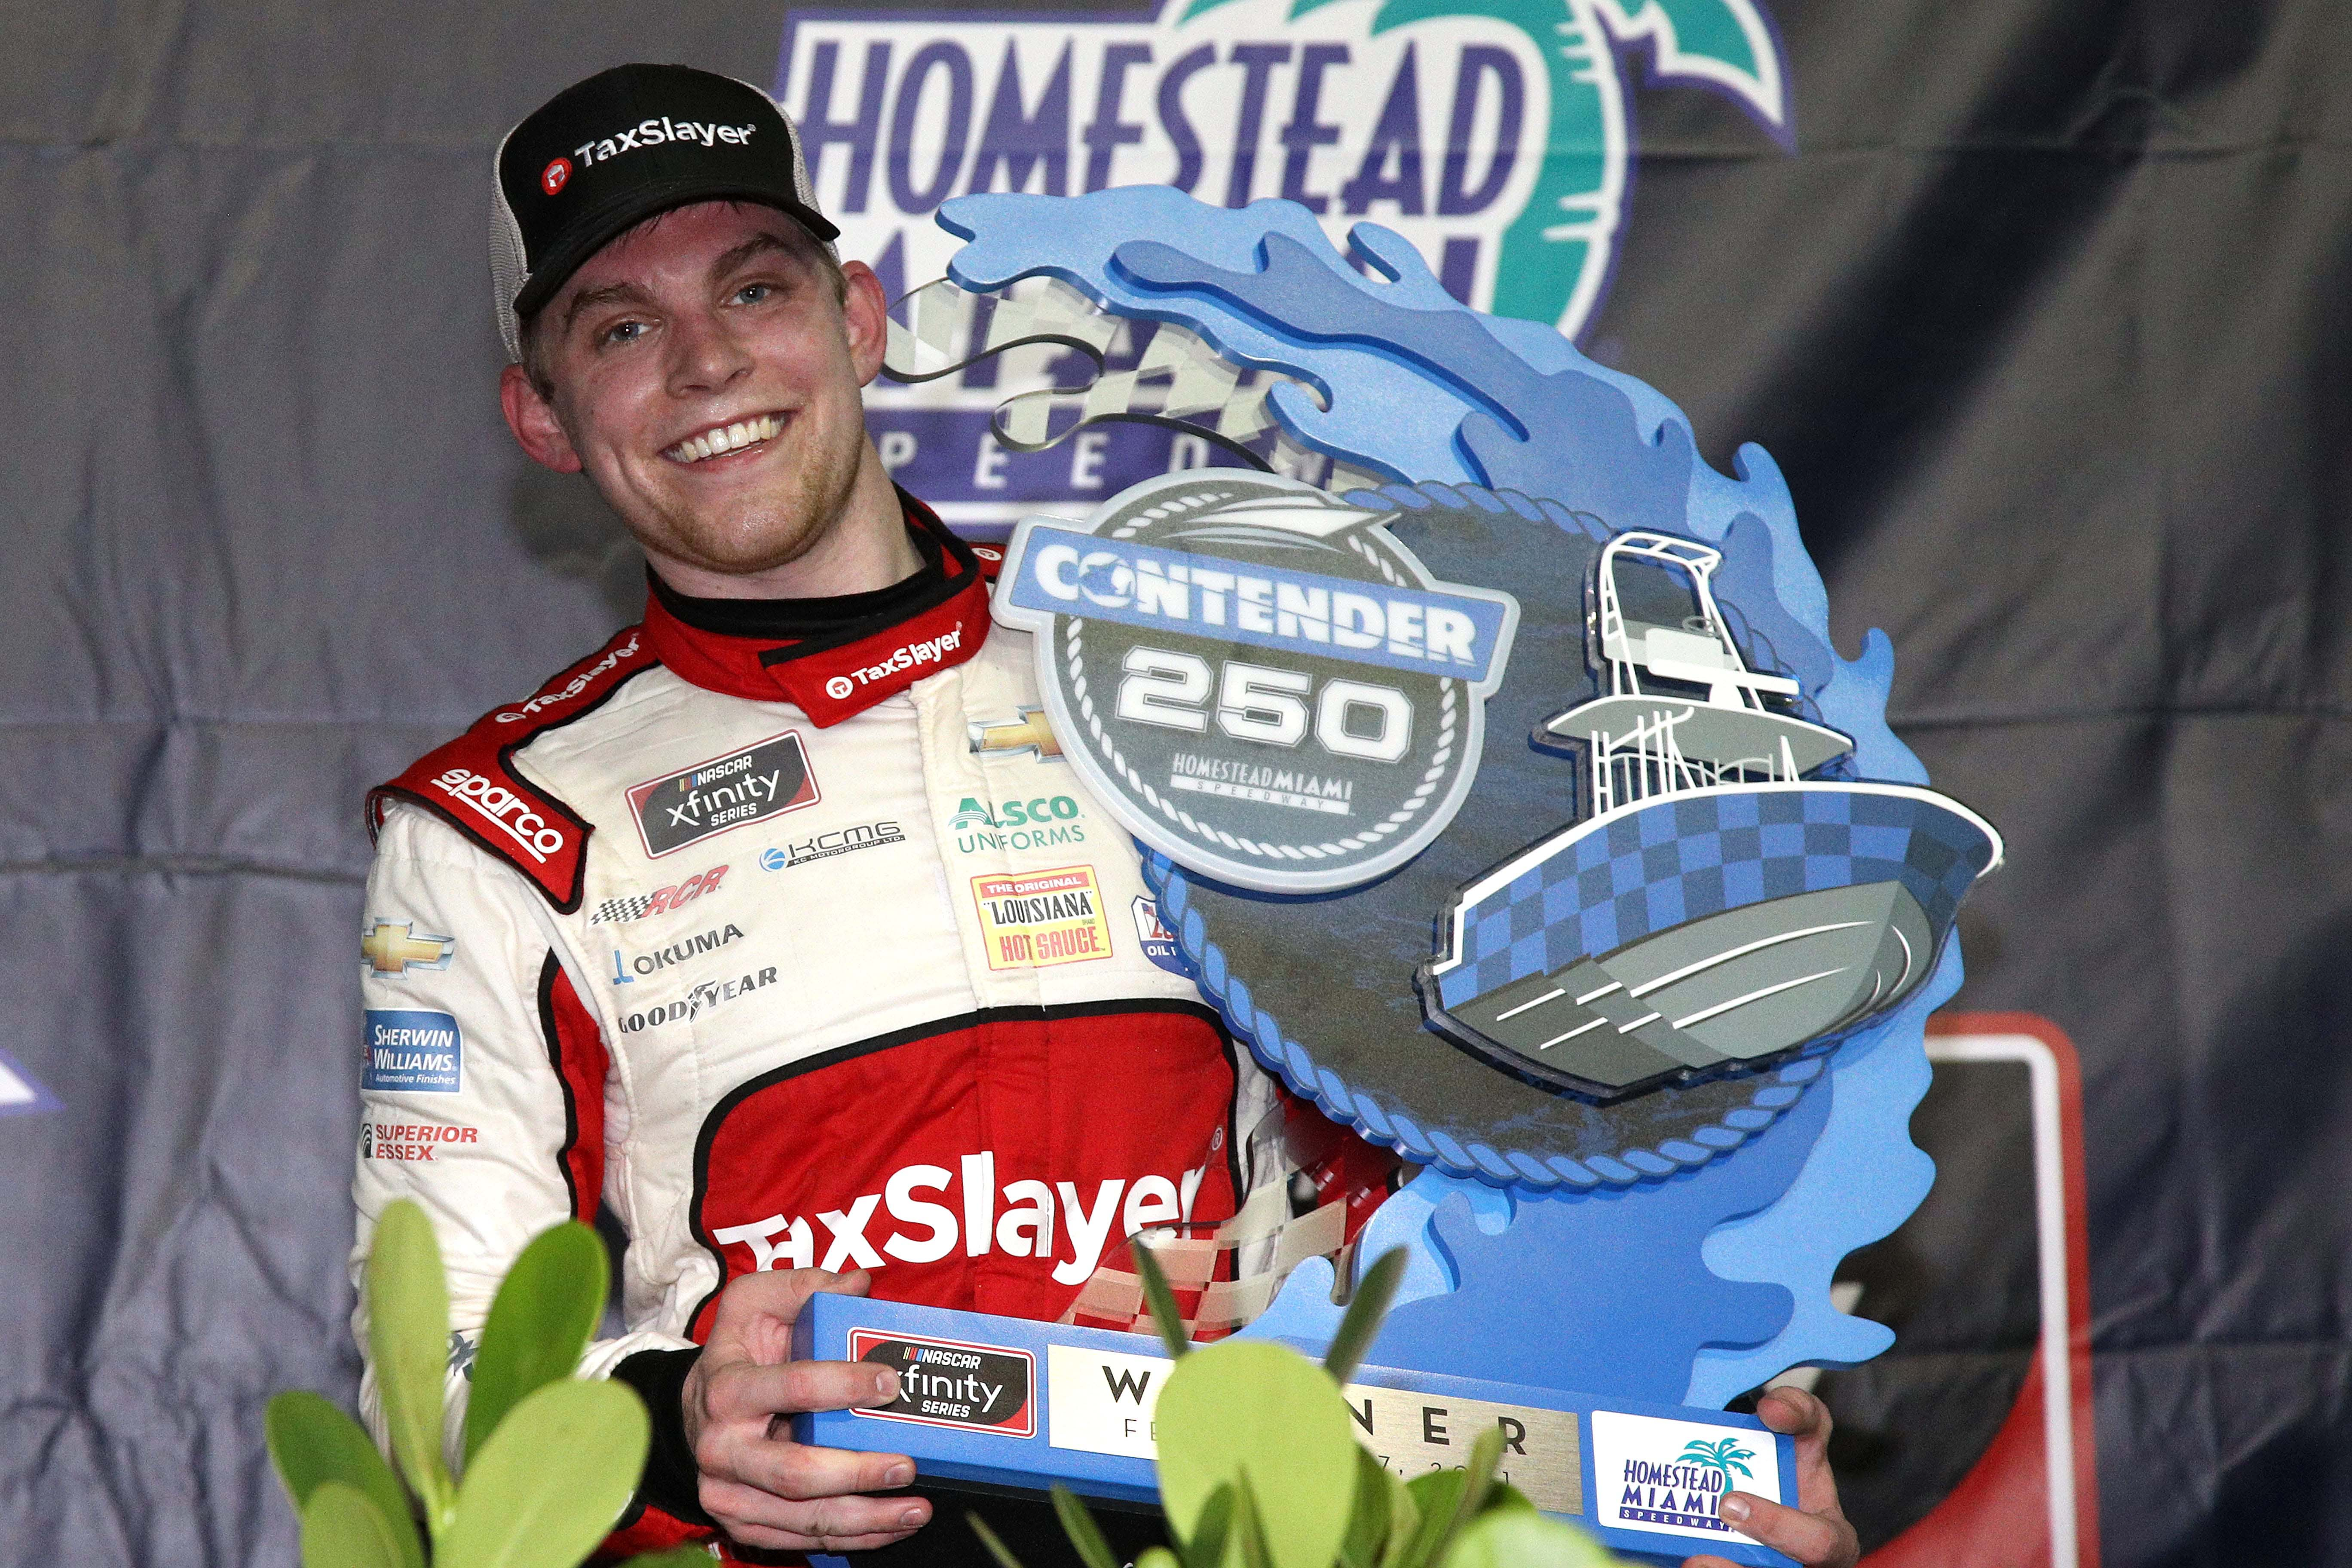 Myatt Snider in victory lane at Homestead-Miami Speedway - NASCAR Xfinity Series